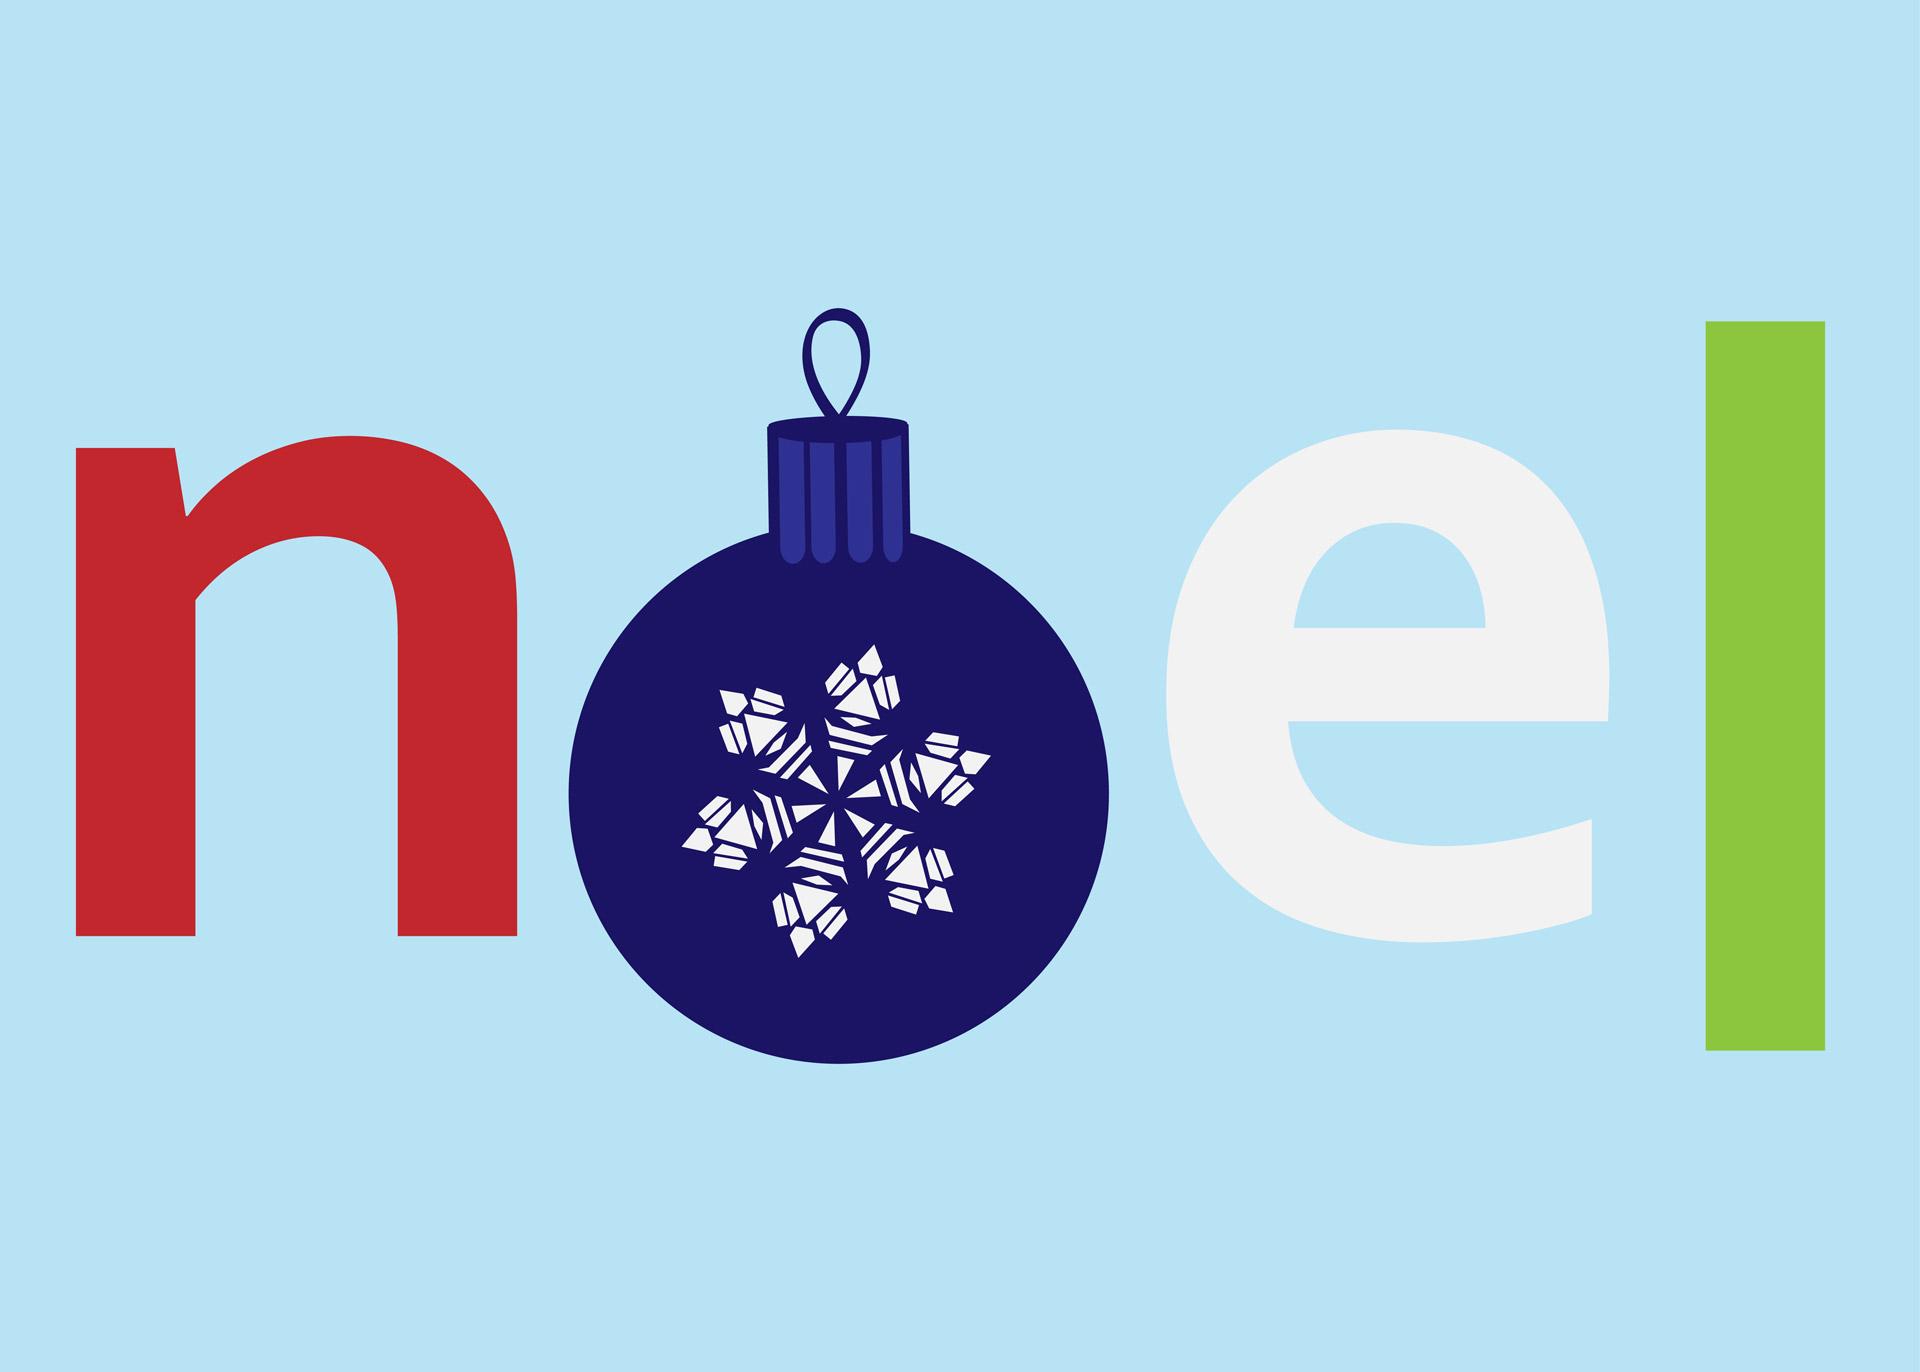 Noel Image.Noel Tekstas Kalėdos žodis Iliustracijos Nemokamos